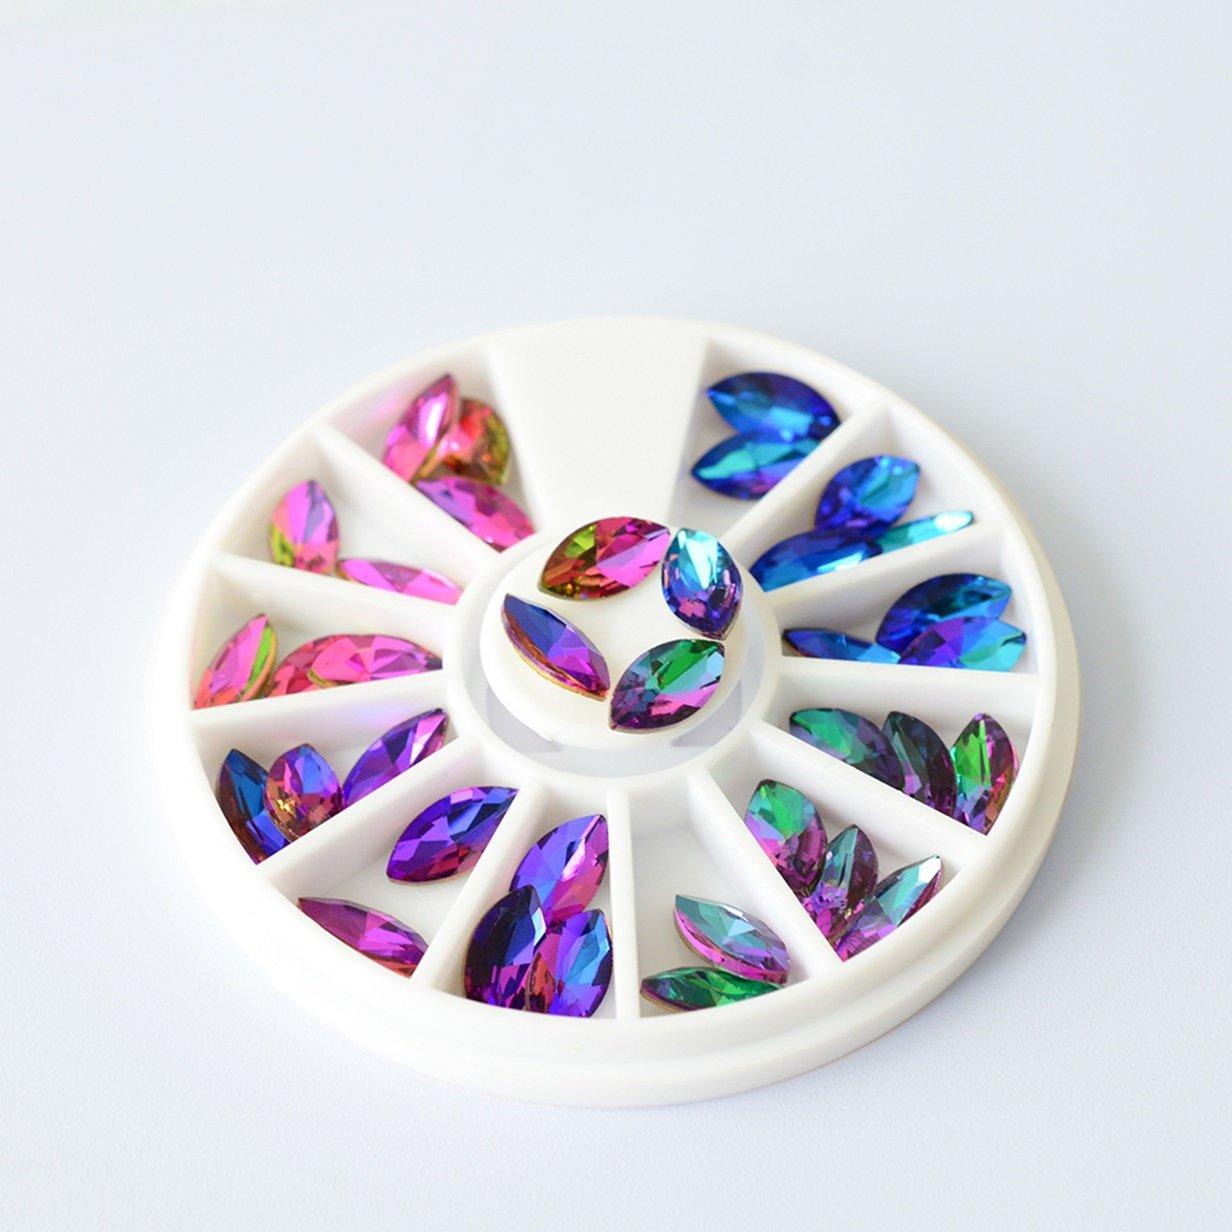 Amazon.com   1 Sets Mix Color Flame Crystal Horse Eyes Acrylic Nail Art  Rhinestone In Wheel 3D Body Phone Decoration DIY Manicure Nails Tools Tips  Kits ... db6d815b0310